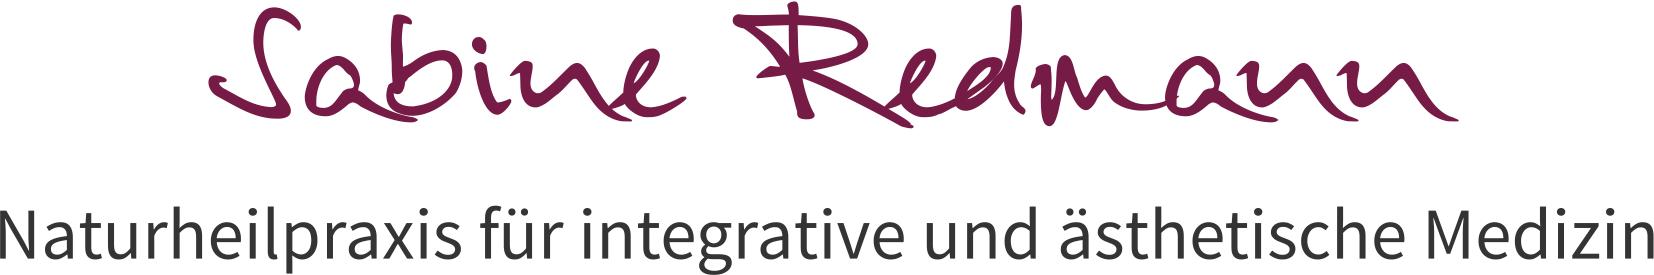 logo-sabine-redmann